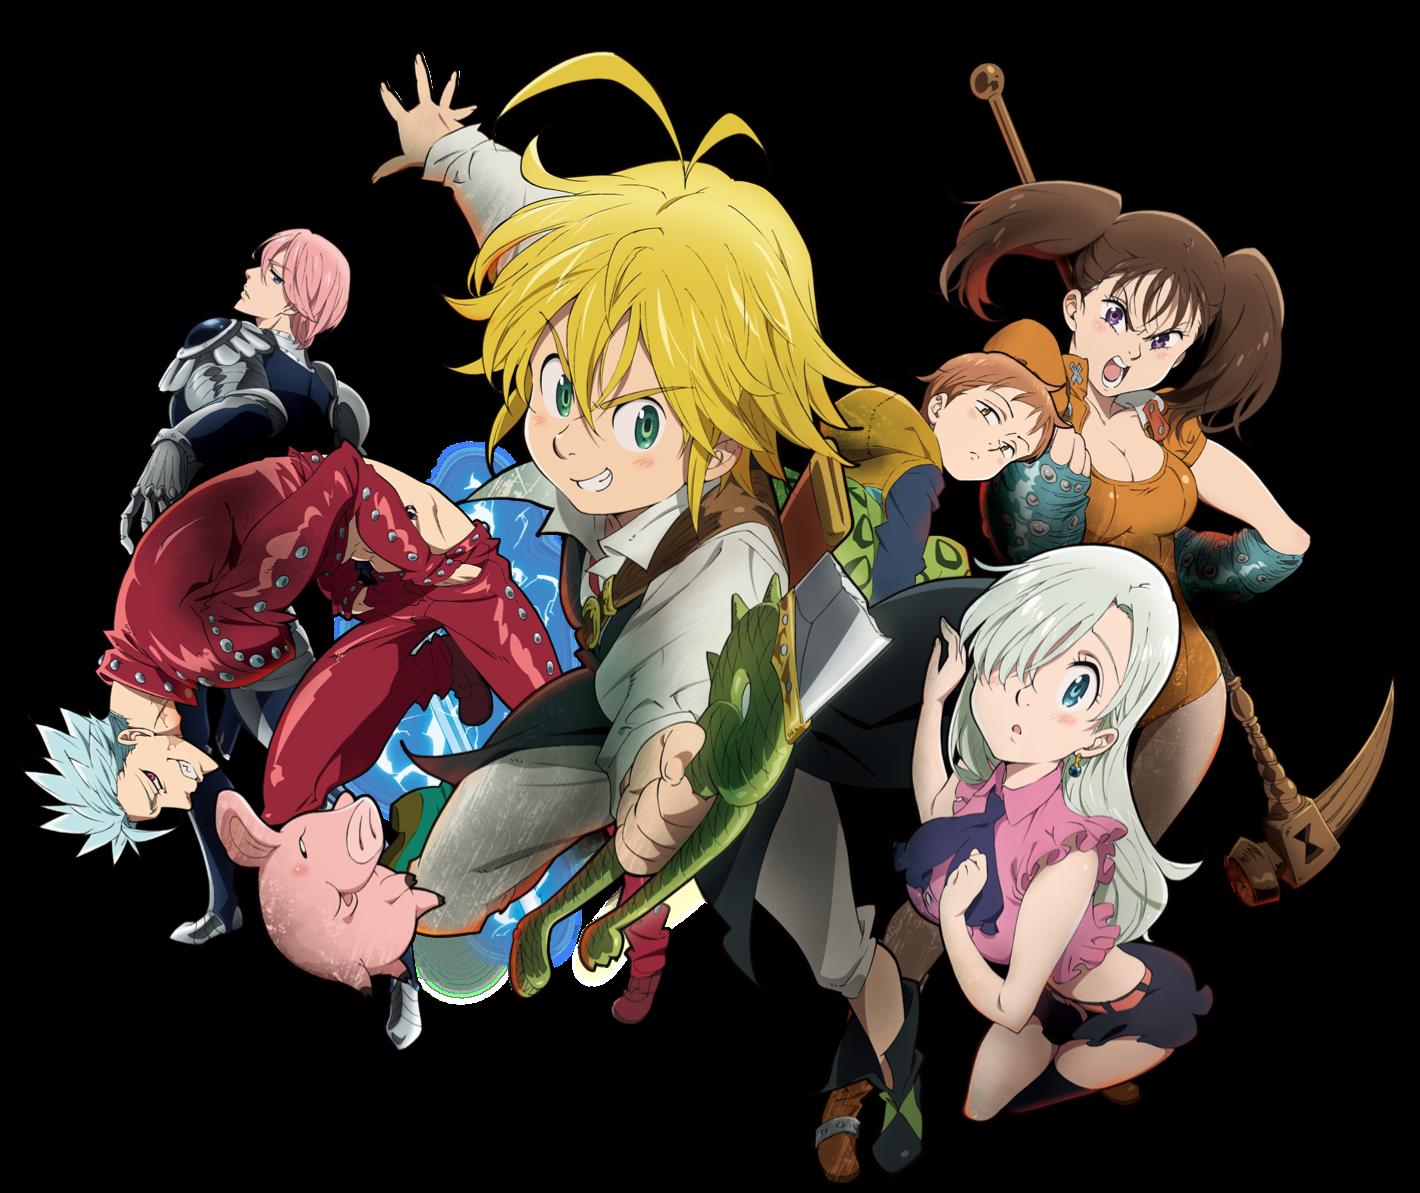 Anime Characters Png : Image anime character visuals nanatsu no taizai